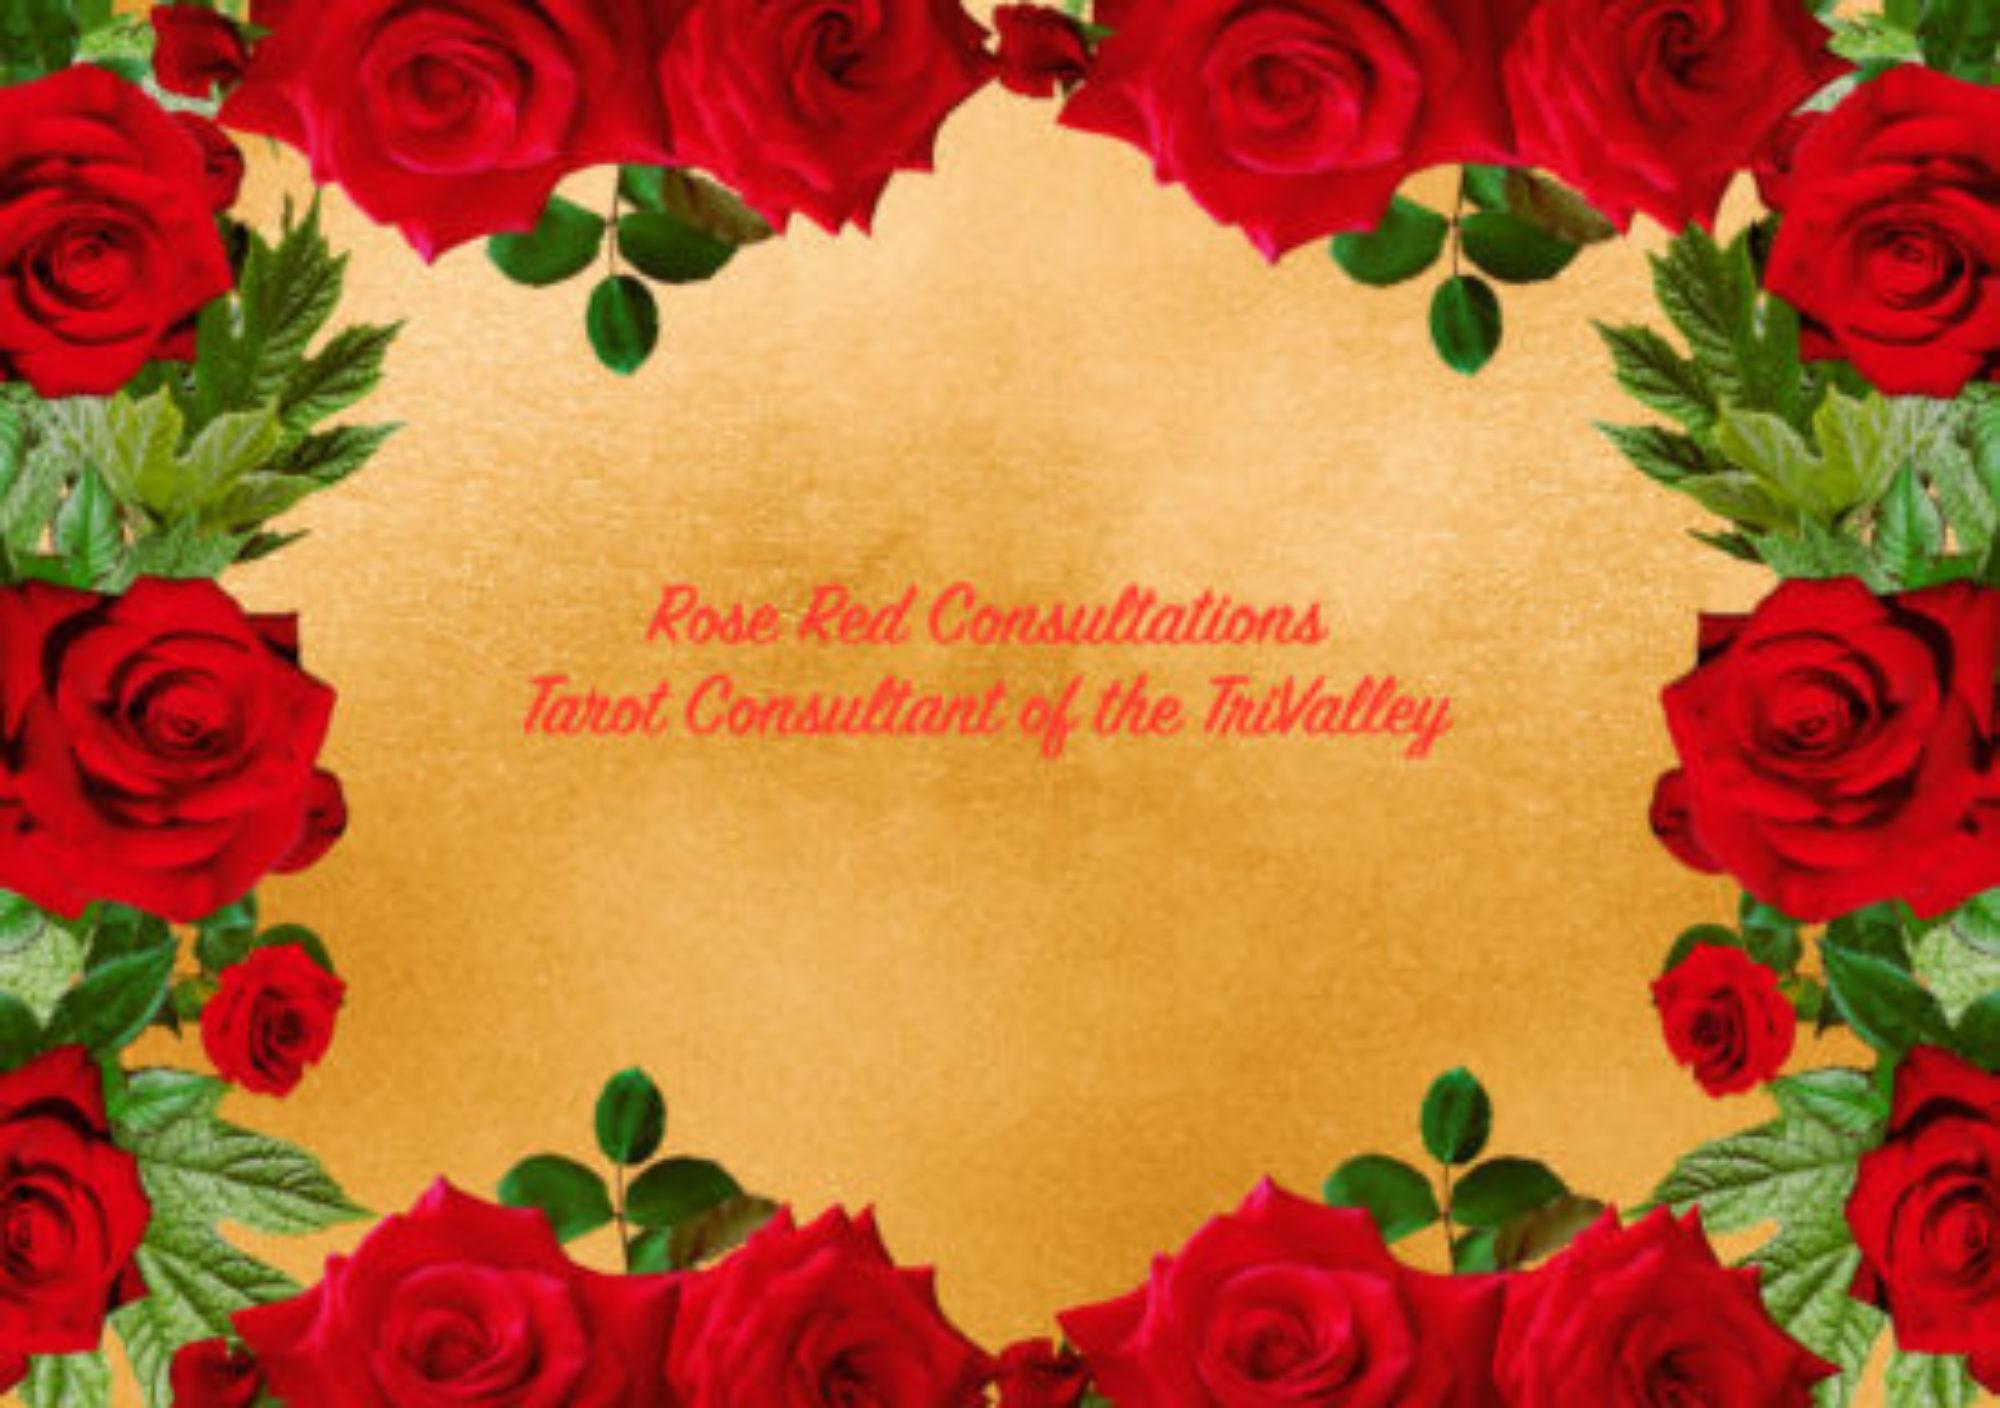 Rose Red Consultations